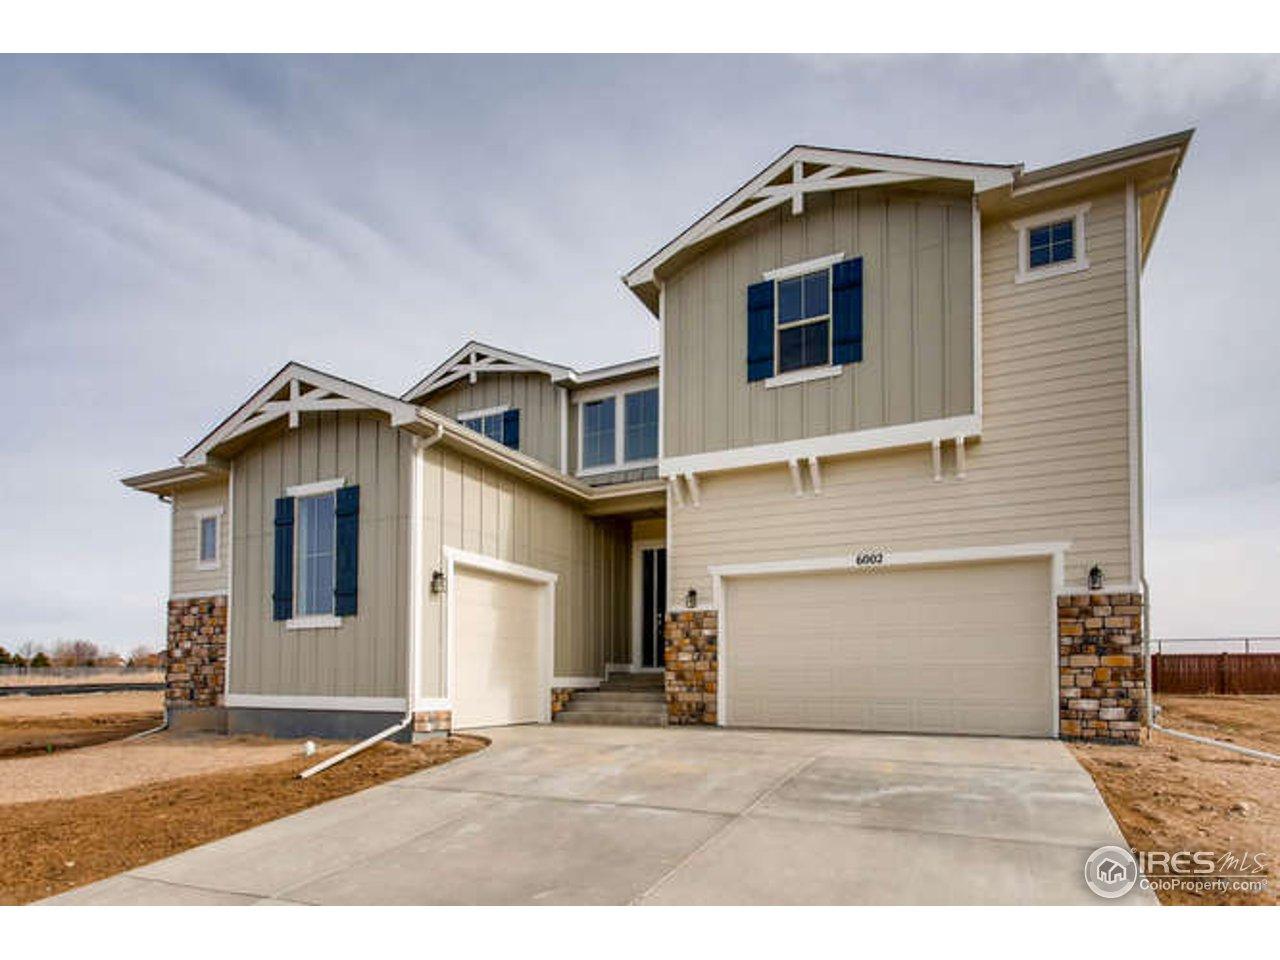 6002 Espalier Ct, Fort Collins CO 80528